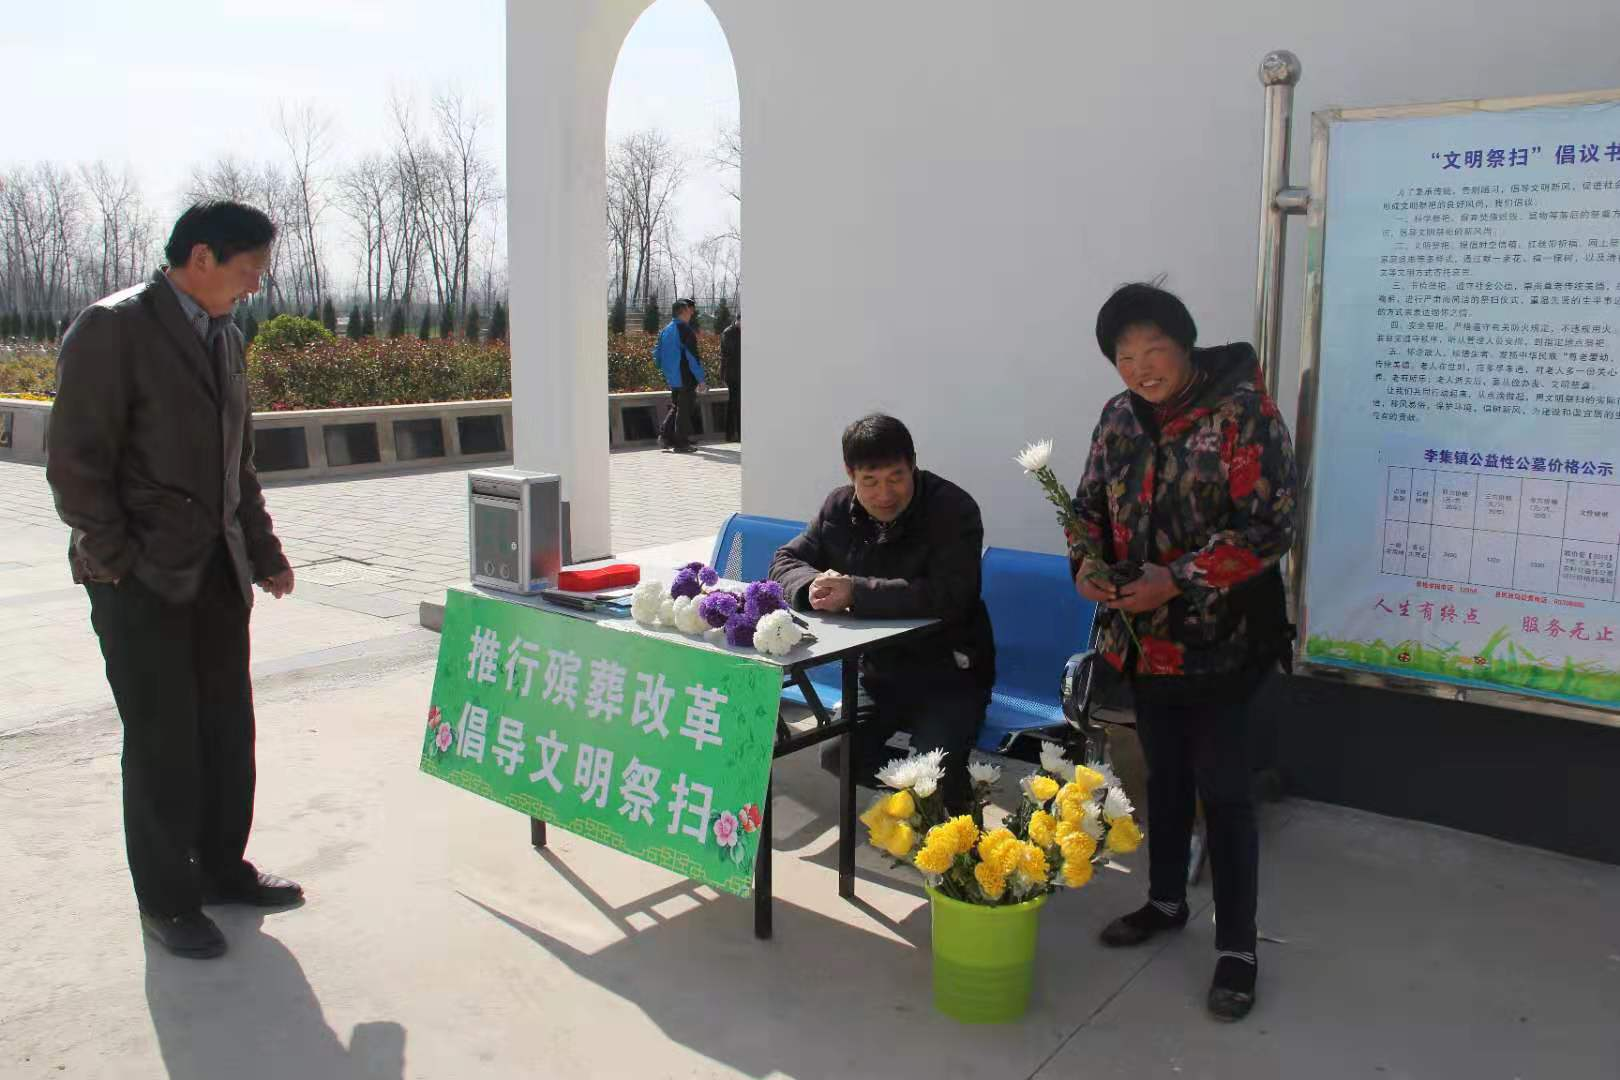 http://www.house31.com/jinrongshichang/68587.html